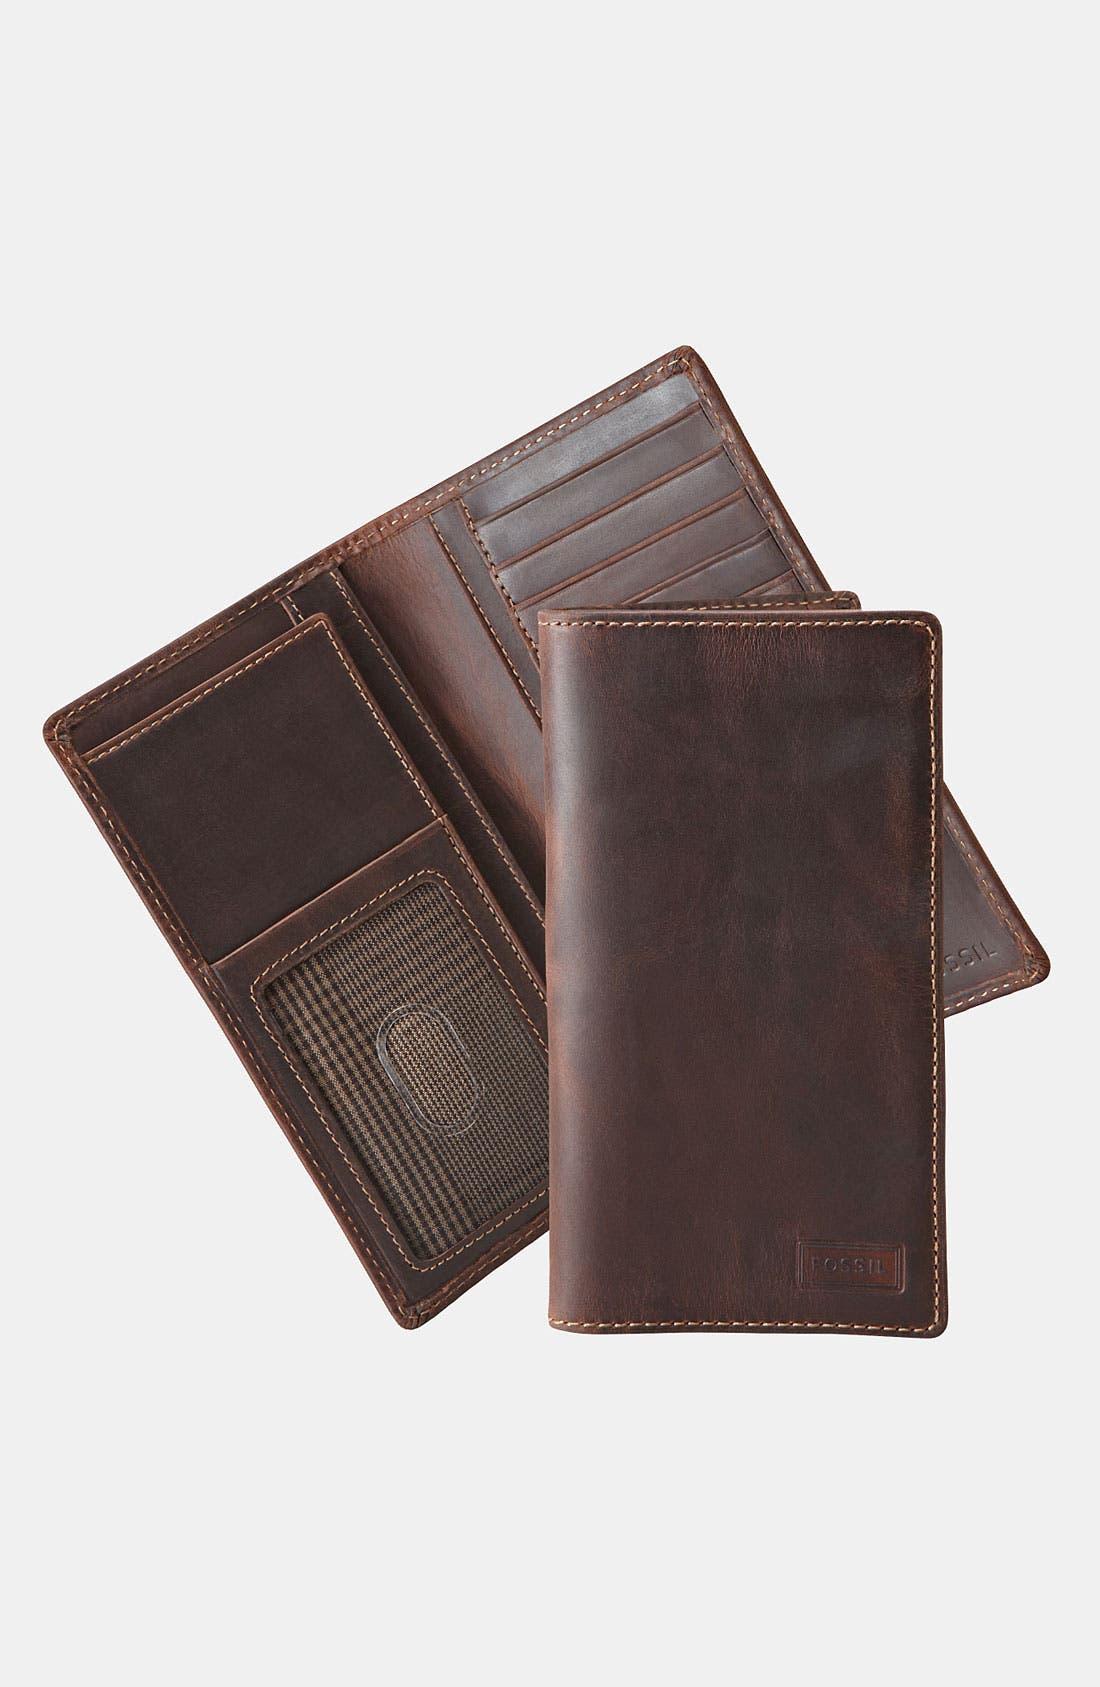 Alternate Image 1 Selected - Fossil 'Sam Secretary' Wallet